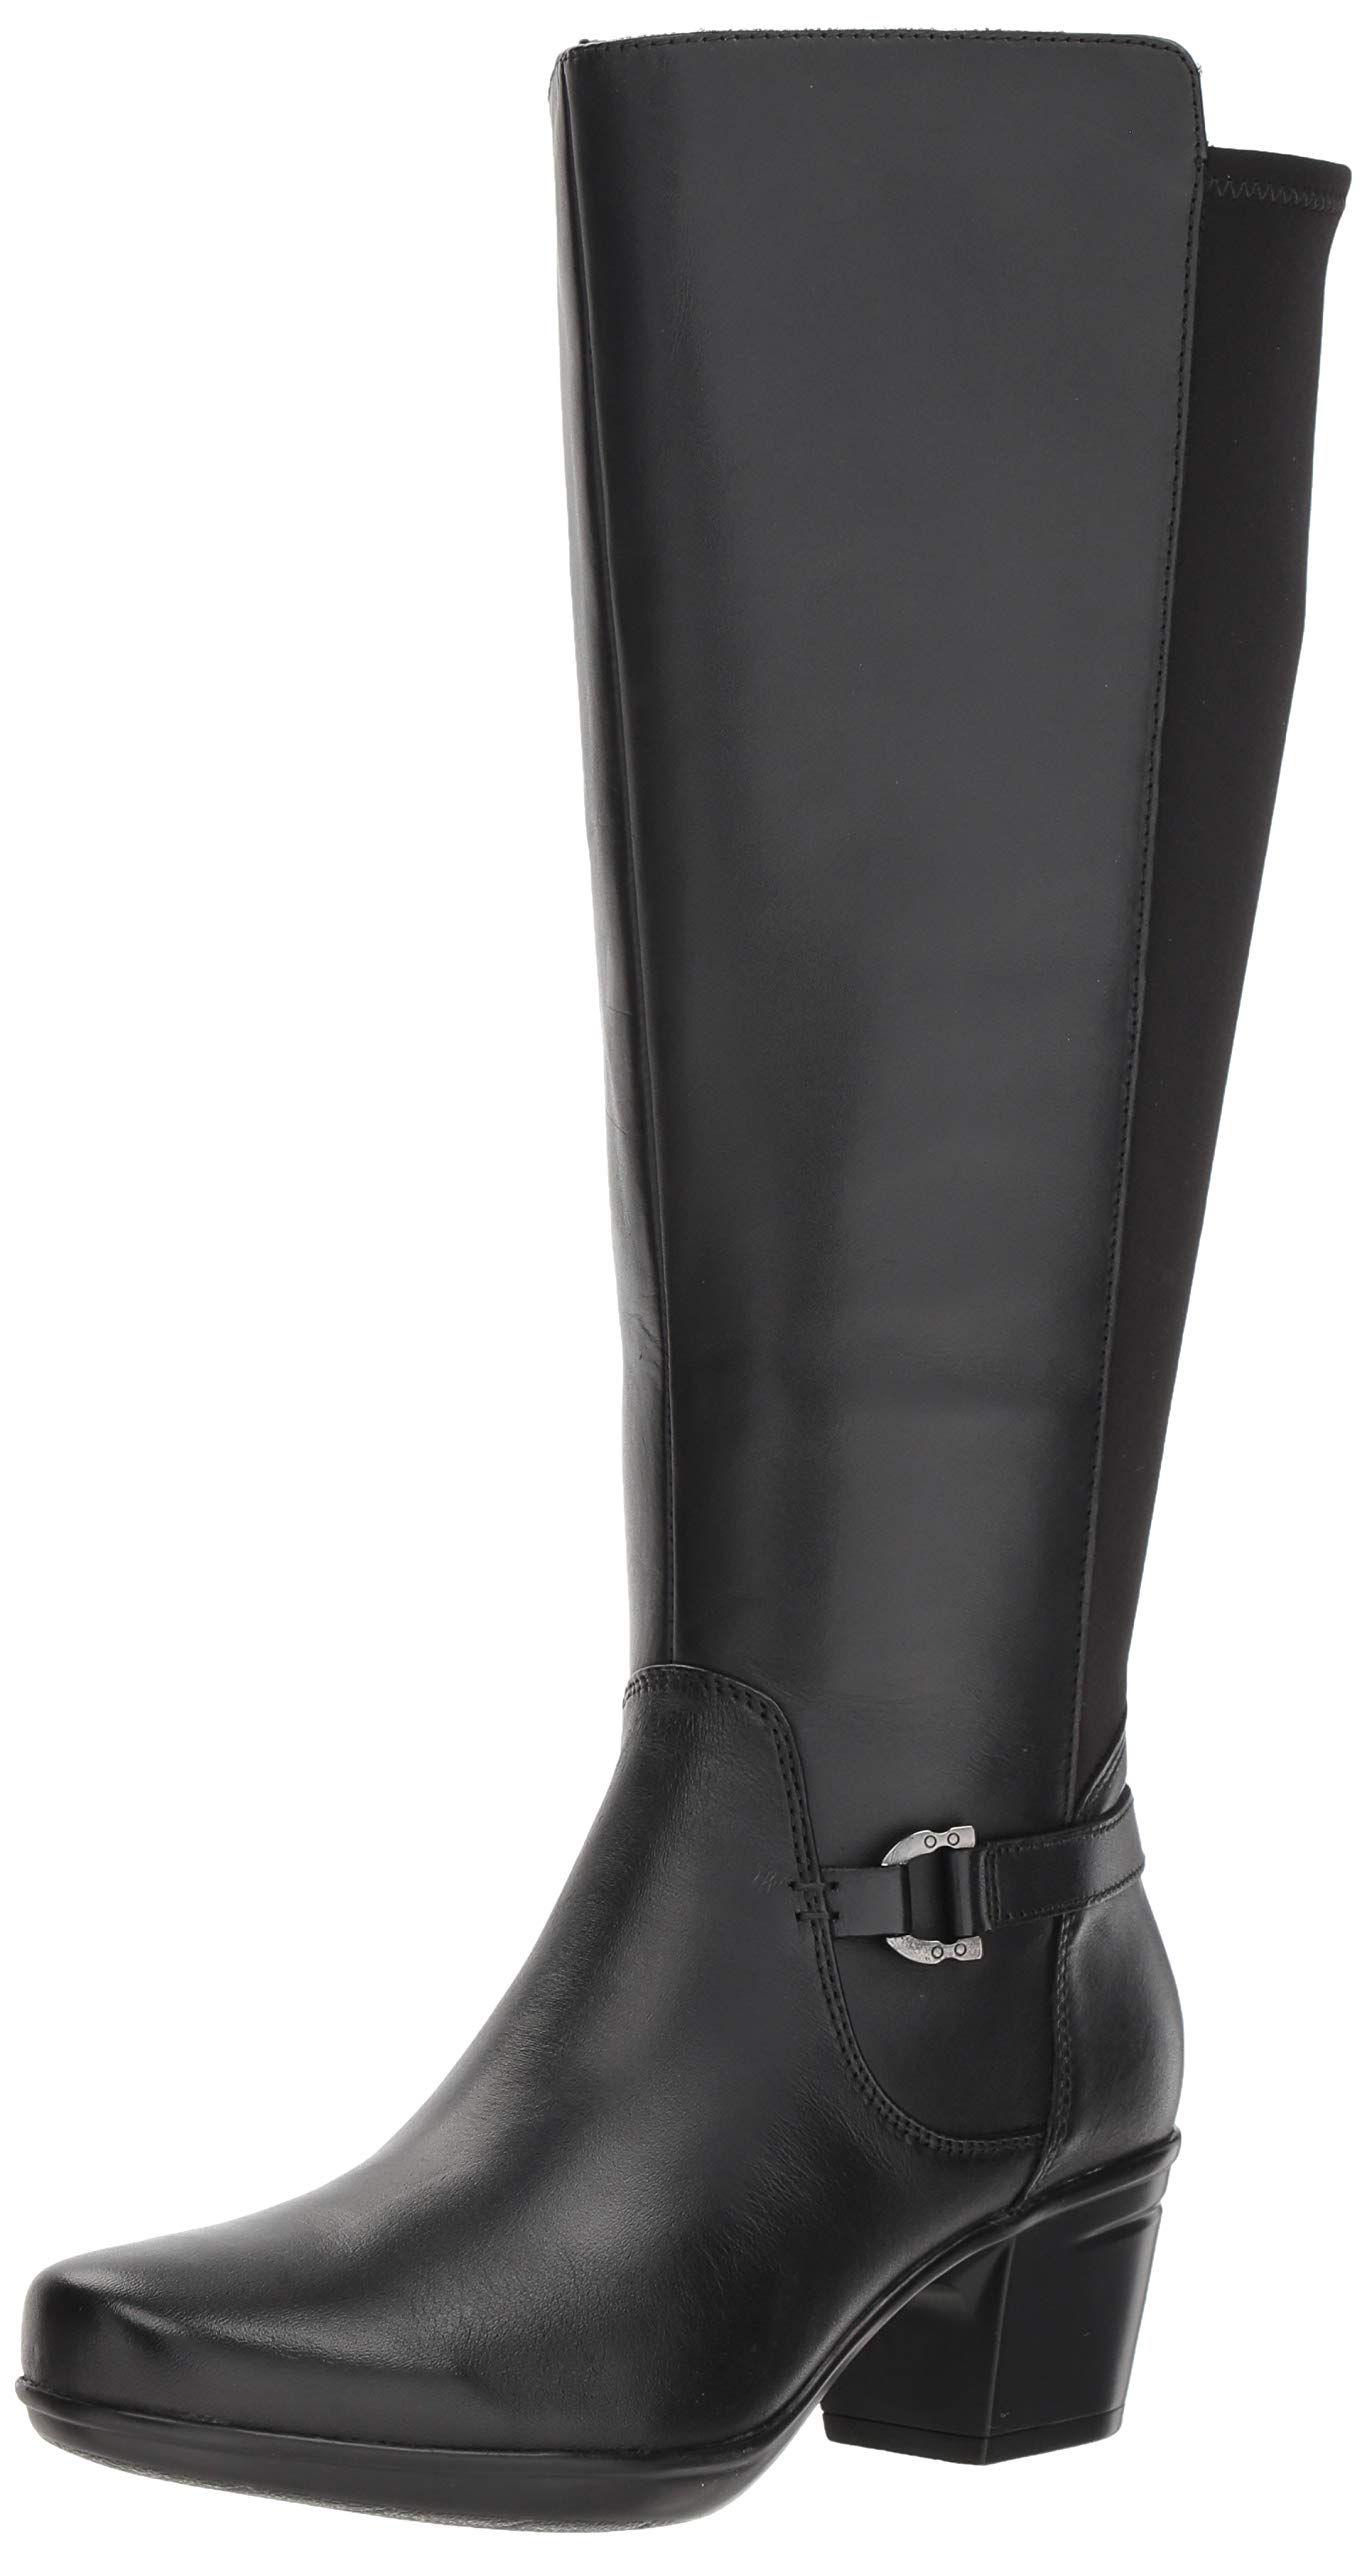 Emslie March Wide Calf Fashion Boot